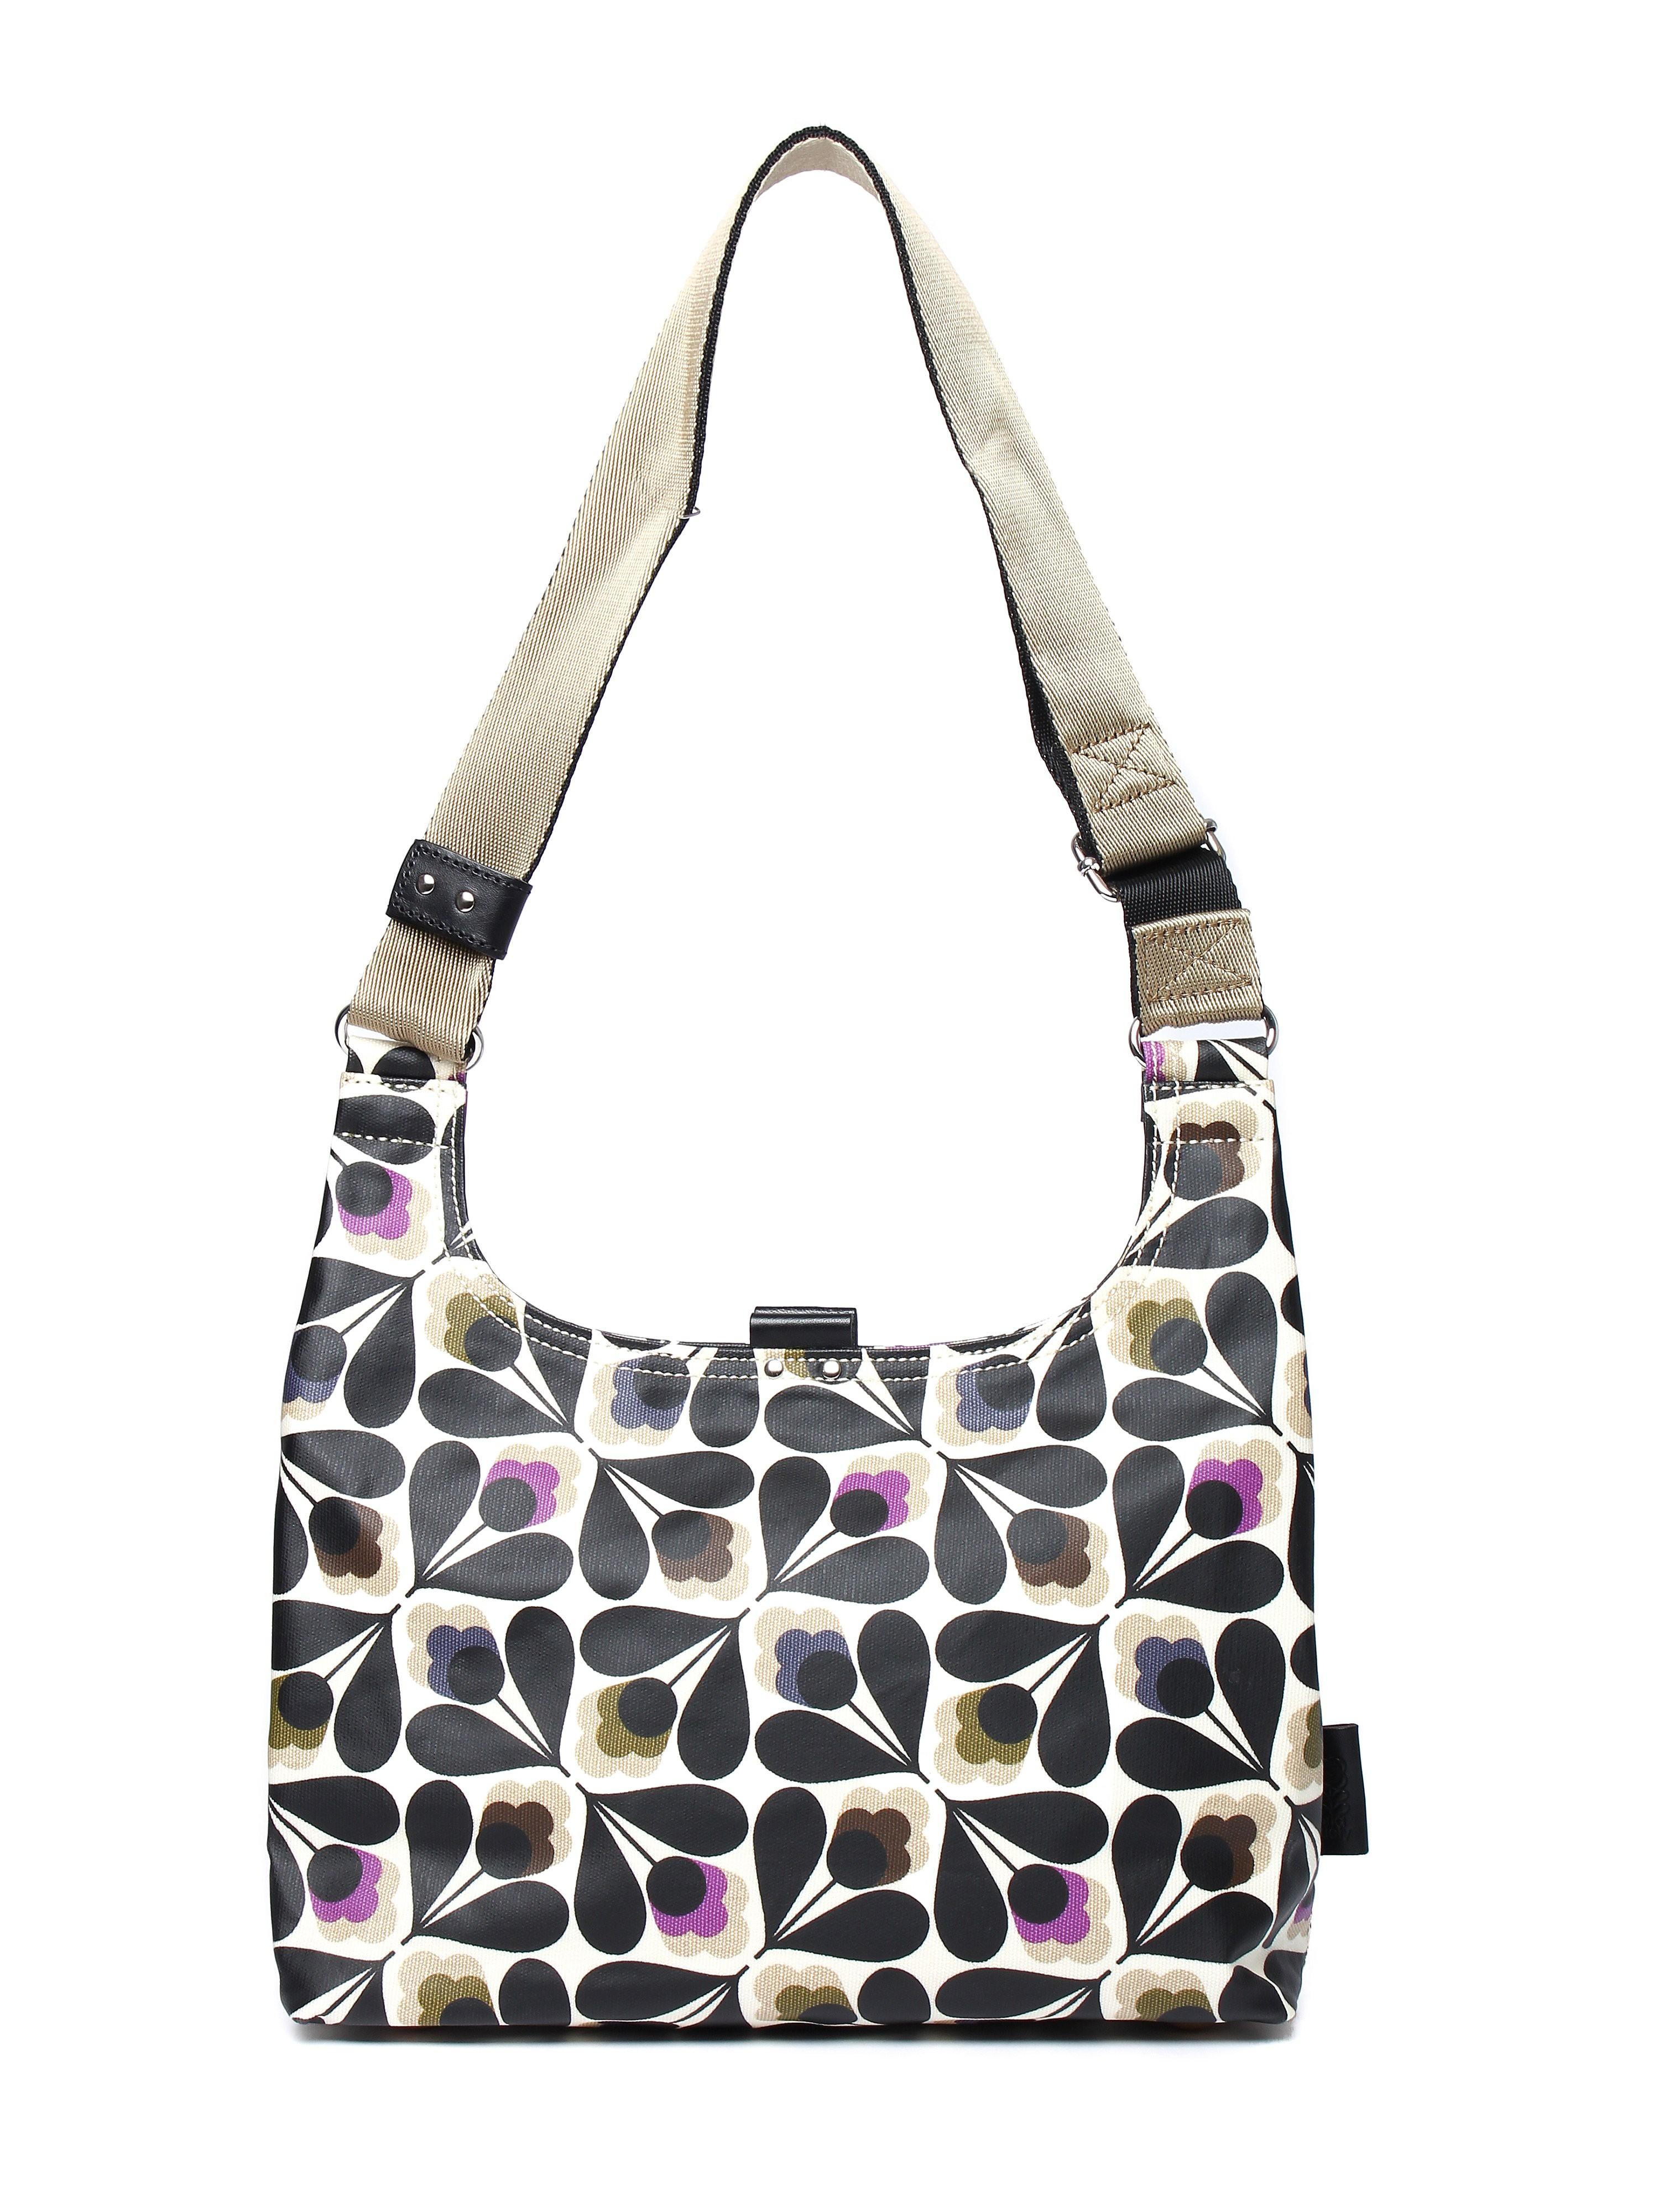 Orla Kiely Women's Mini Sling Bag - Multi Sycamore Seed